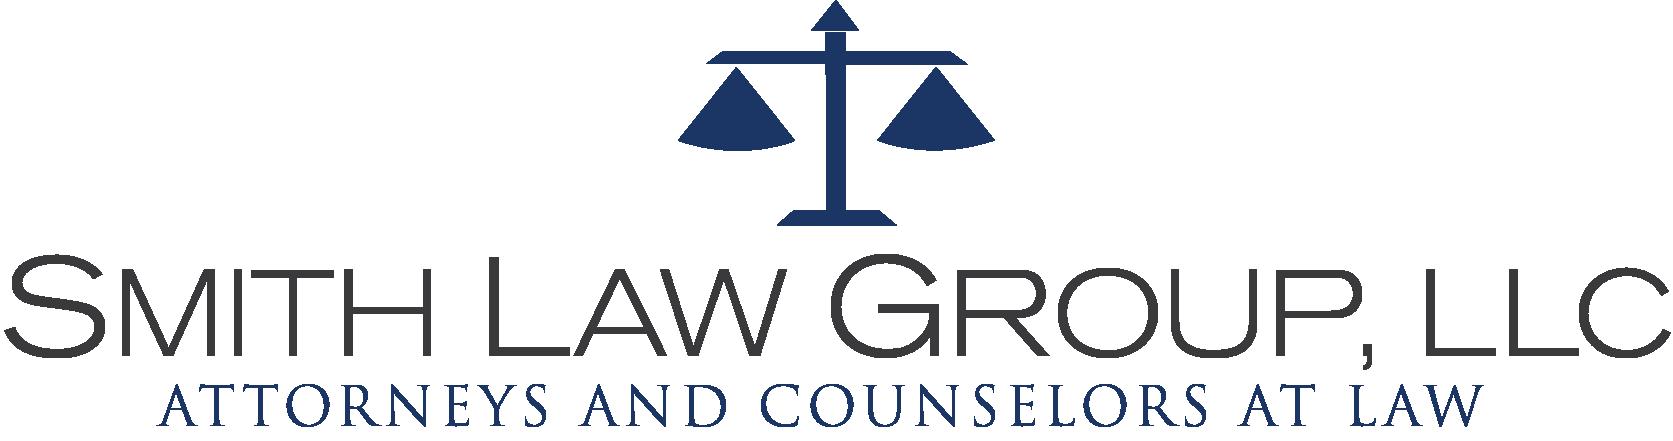 Smith Law Group Logo